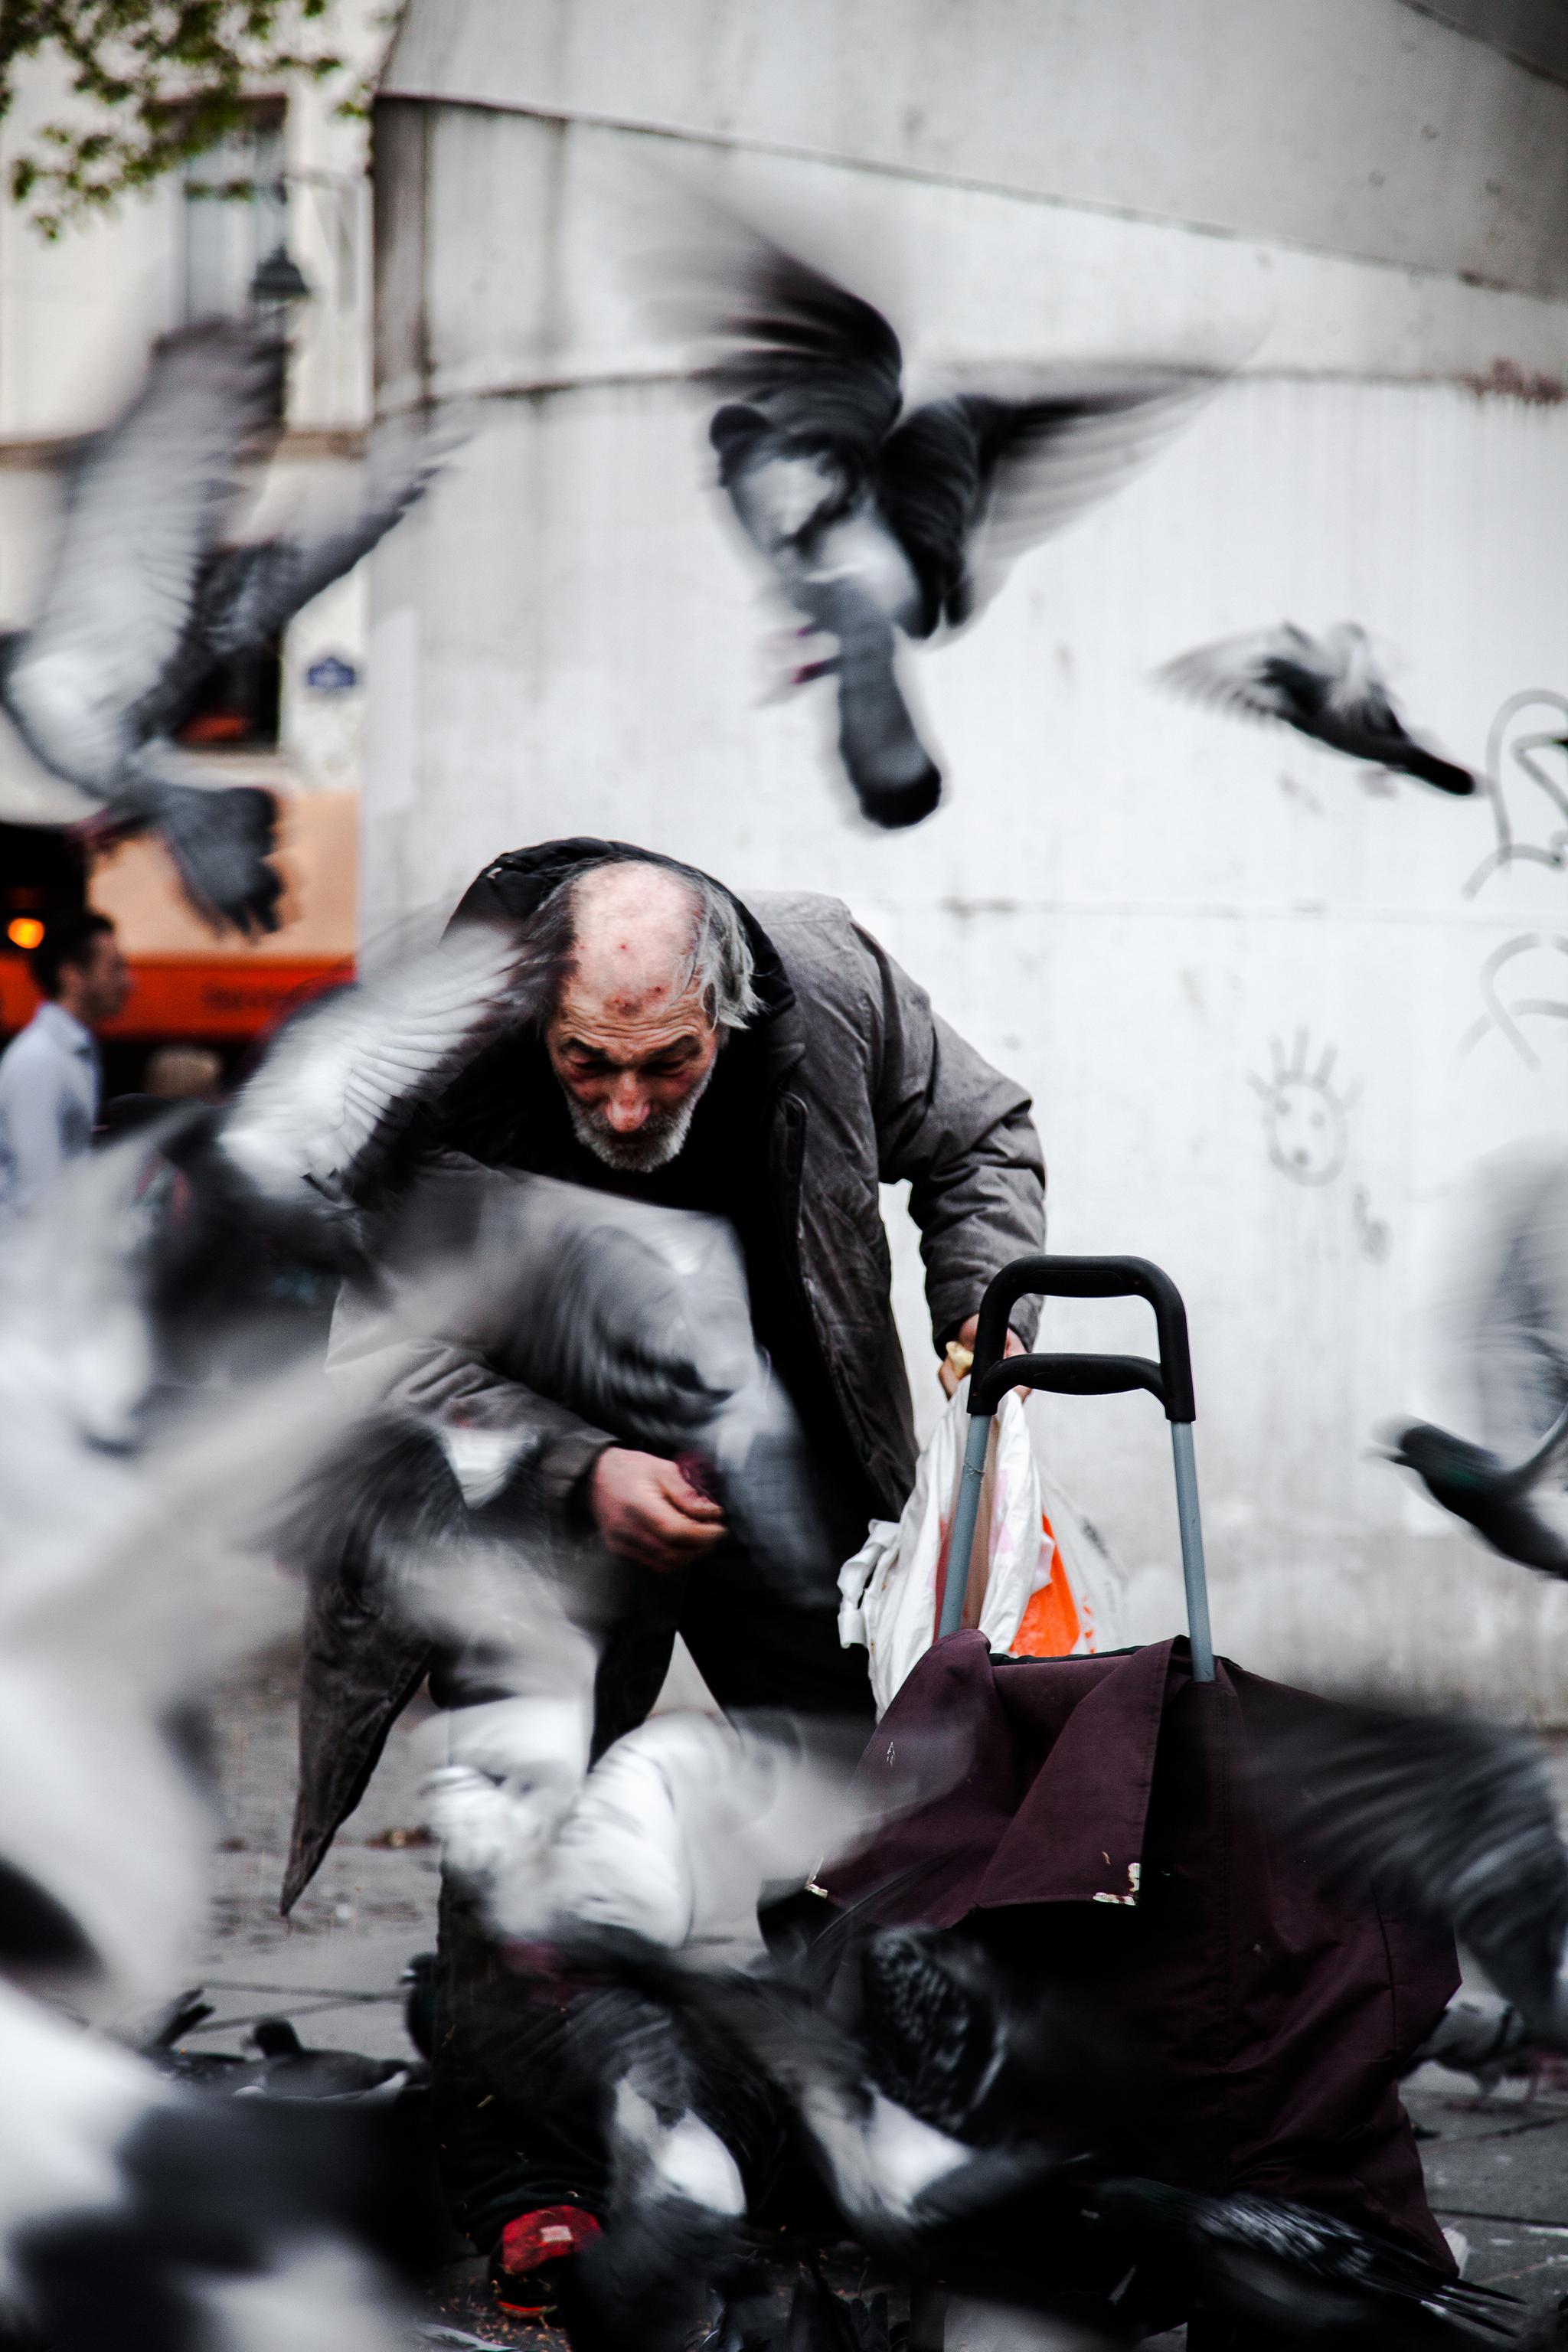 pigeonman-10.png